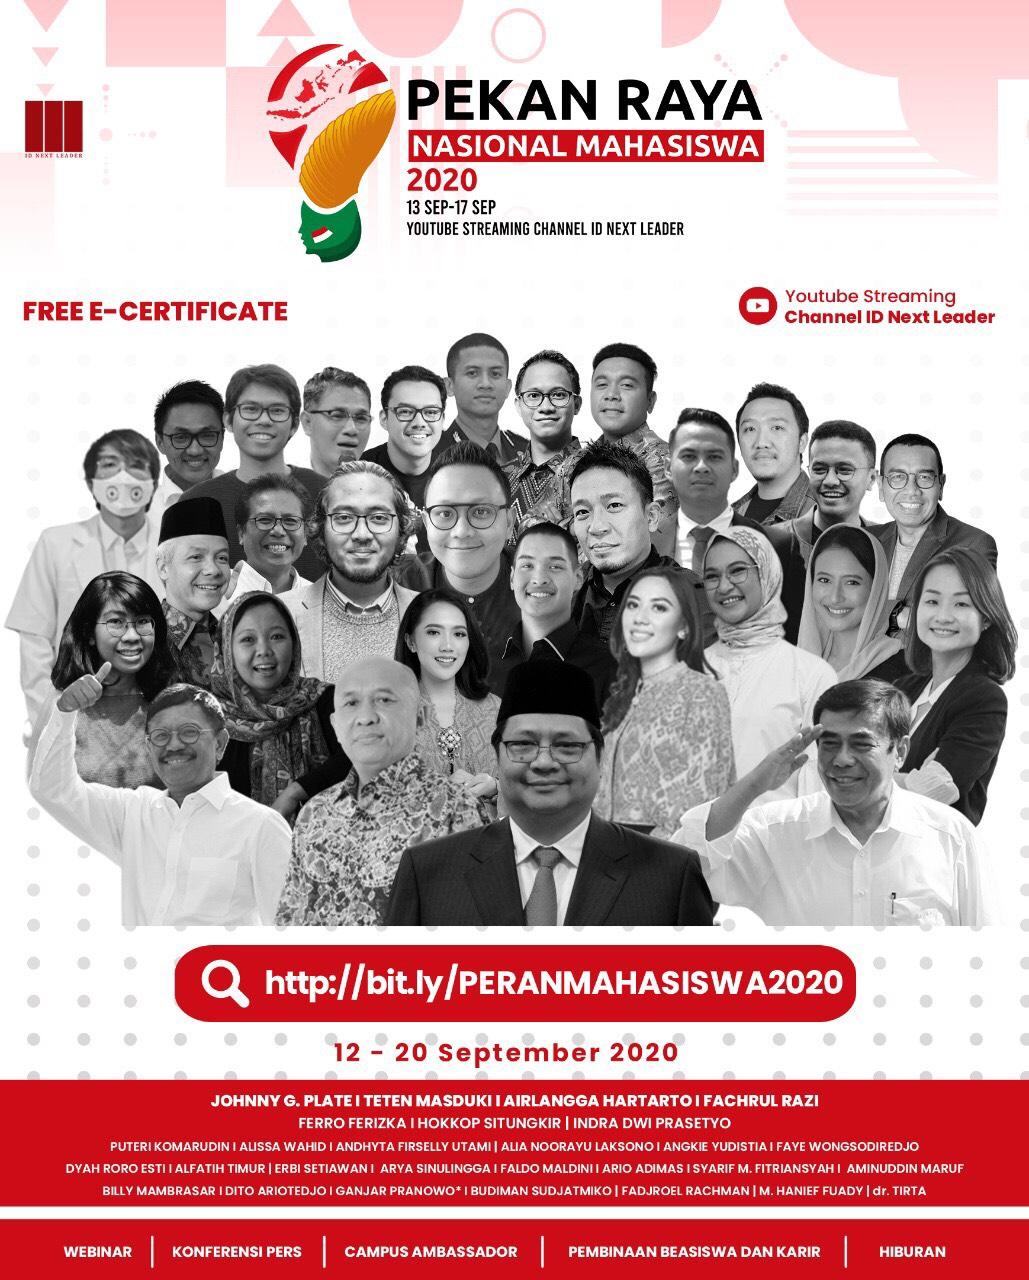 Pekan Raya Nasional Mahasiswa 2020